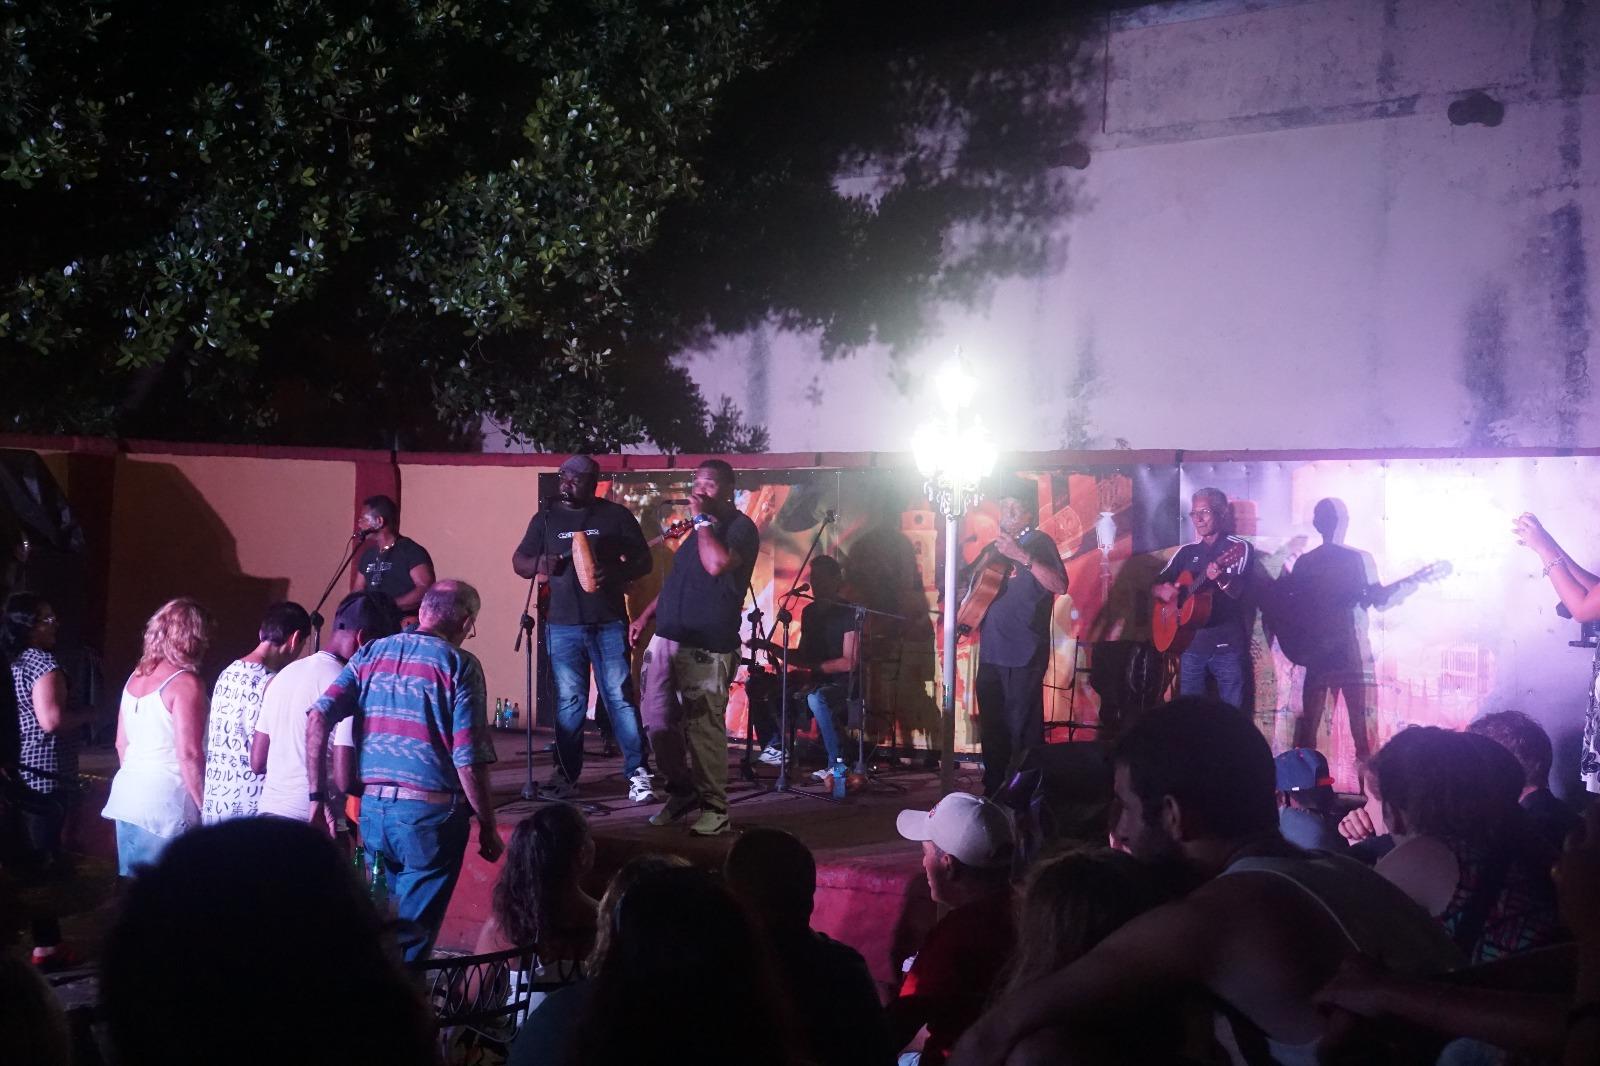 Trinidad'da Sıradan Bir Gece